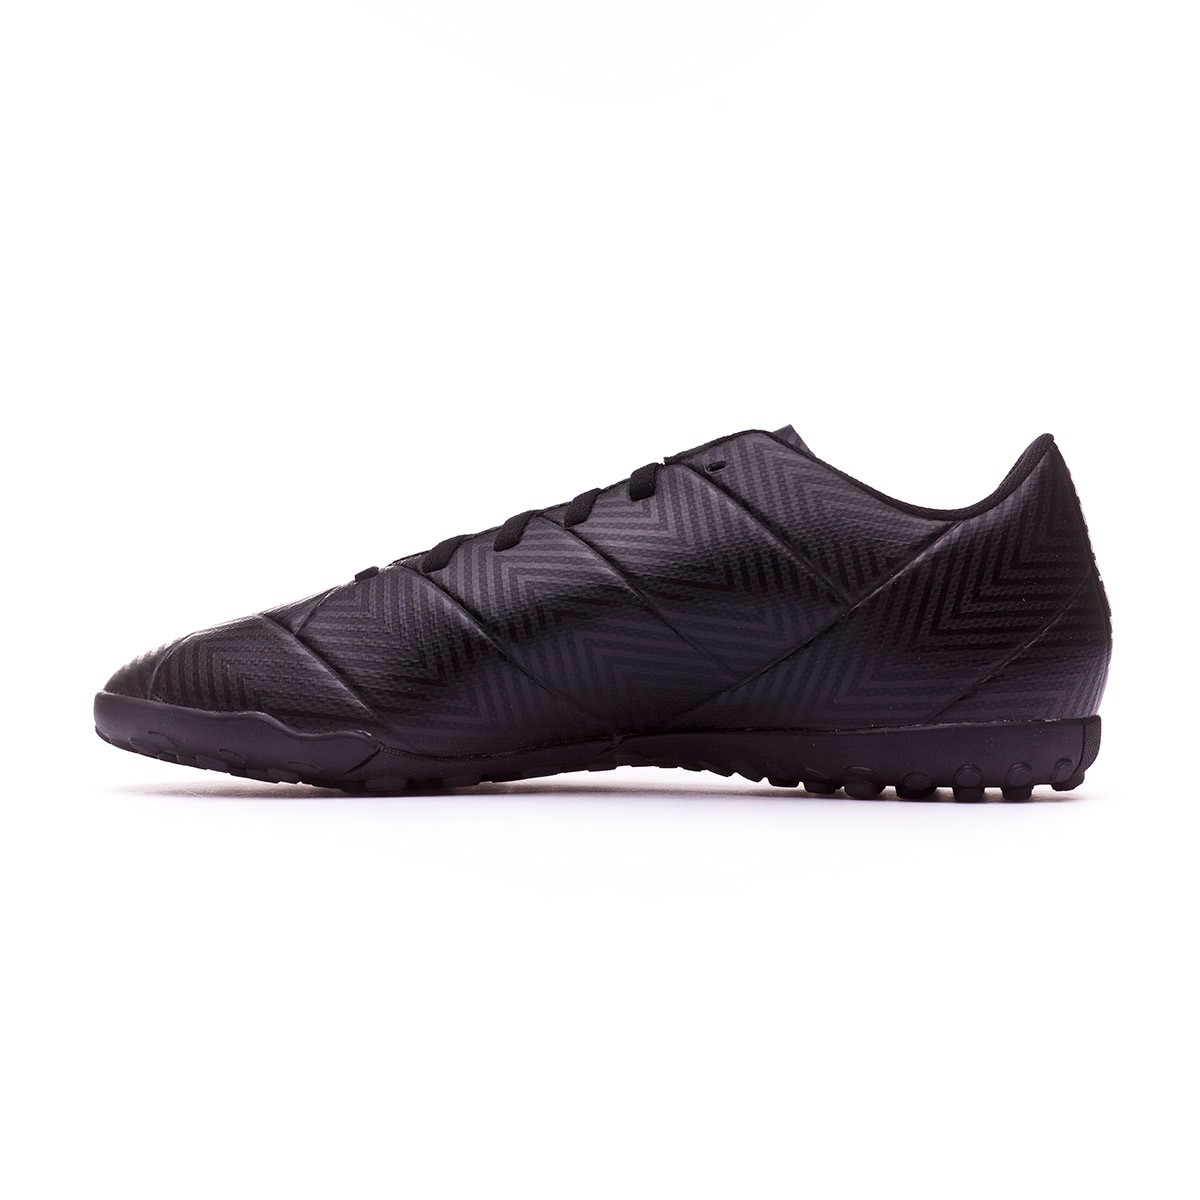 0286cd639fc8a Tenis adidas Nemeziz Tango 18.4 Turf Core black-White - Tienda de fútbol  Fútbol Emotion